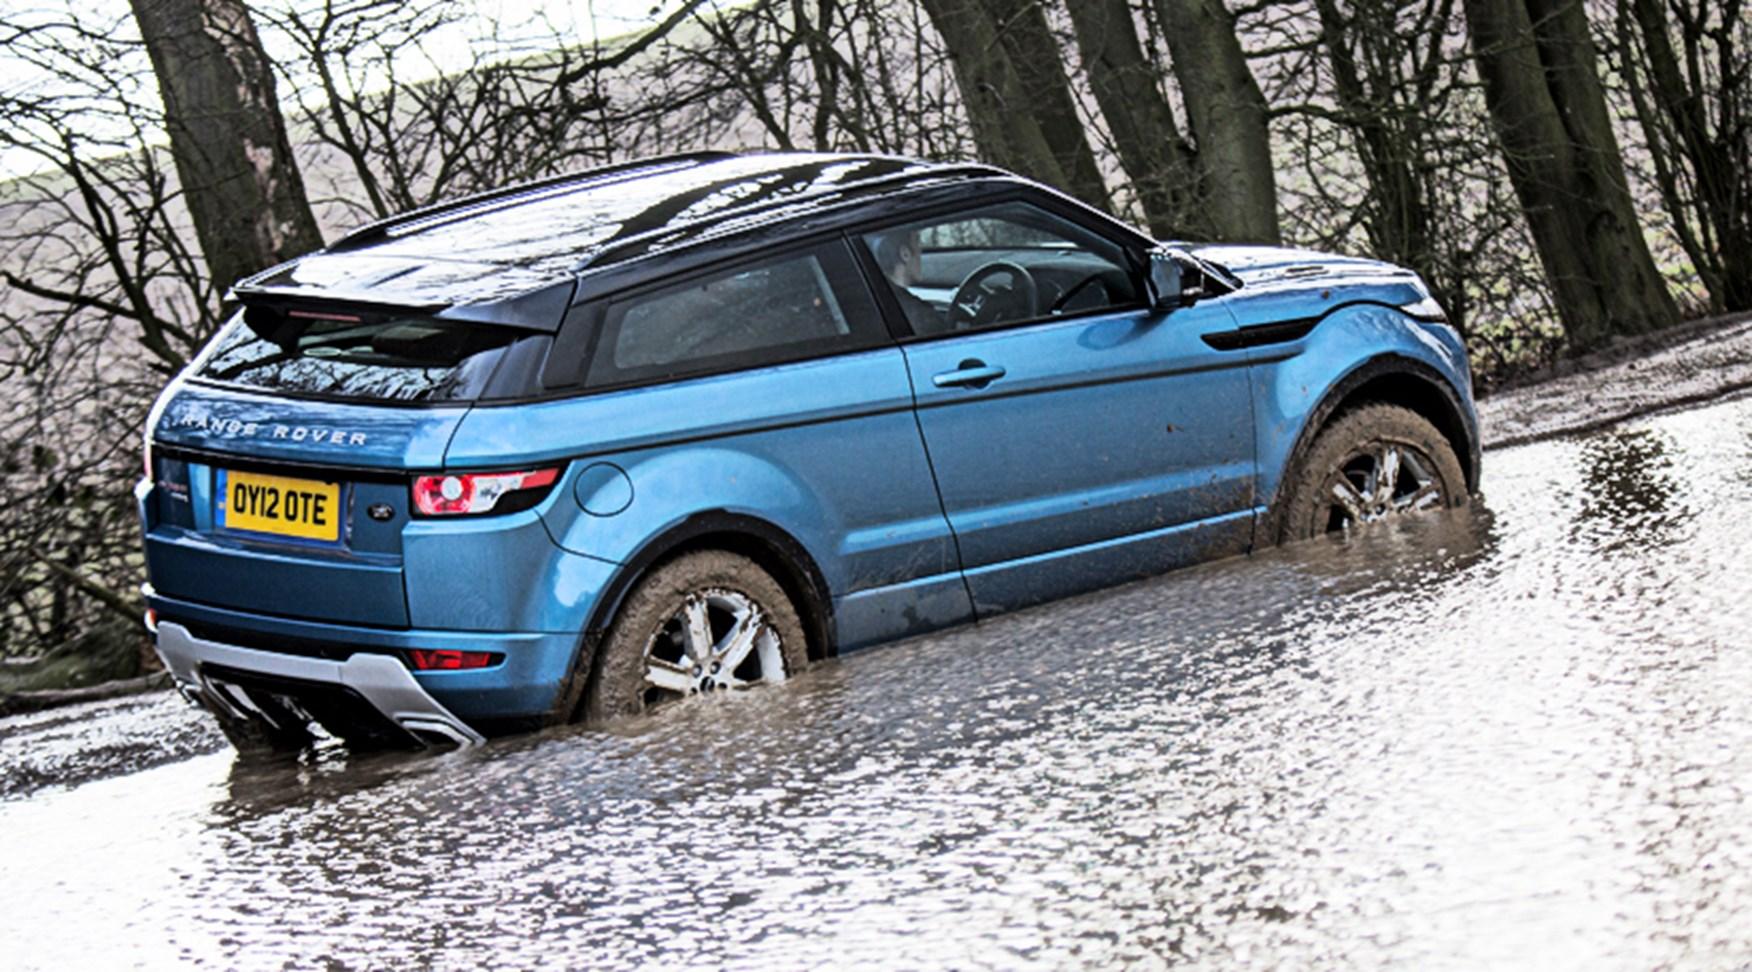 Phil Long Value Car >> Range Rover Evoque (2012) long-term test review | CAR Magazine